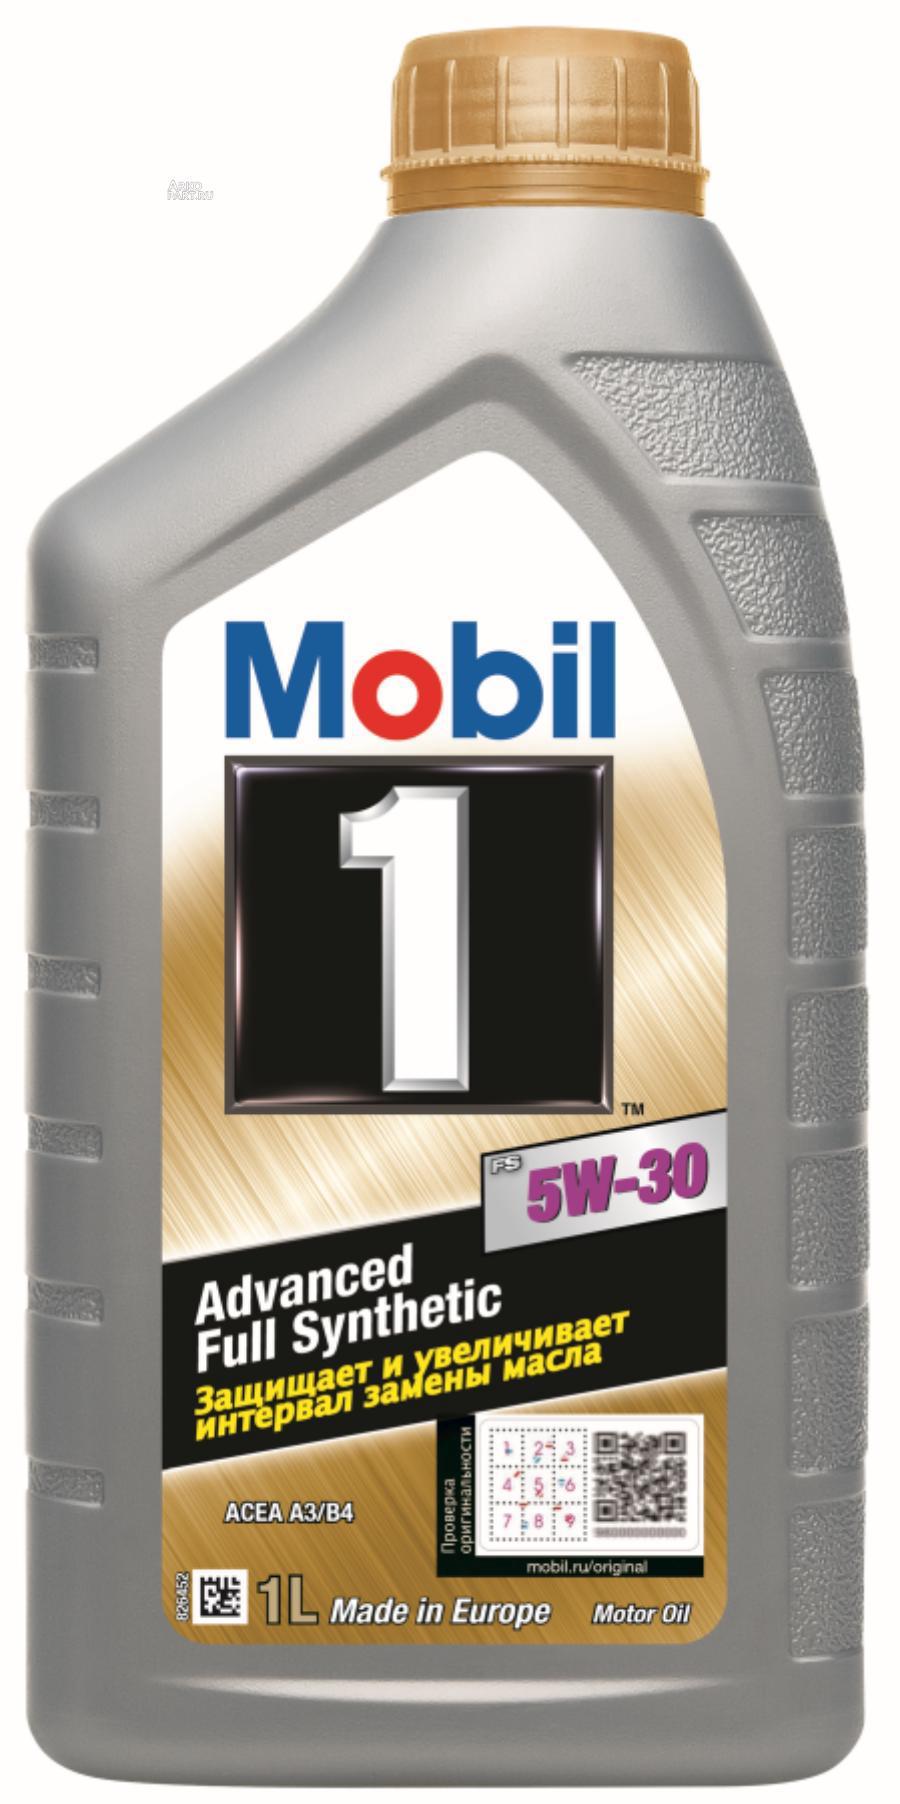 Mobil 1 FS 5W30 (1L)_масло моторное! синт.\ API SN, ACEA A3/B3/B4 VW 502 00,VW 505 00,MB 229.3/229.5